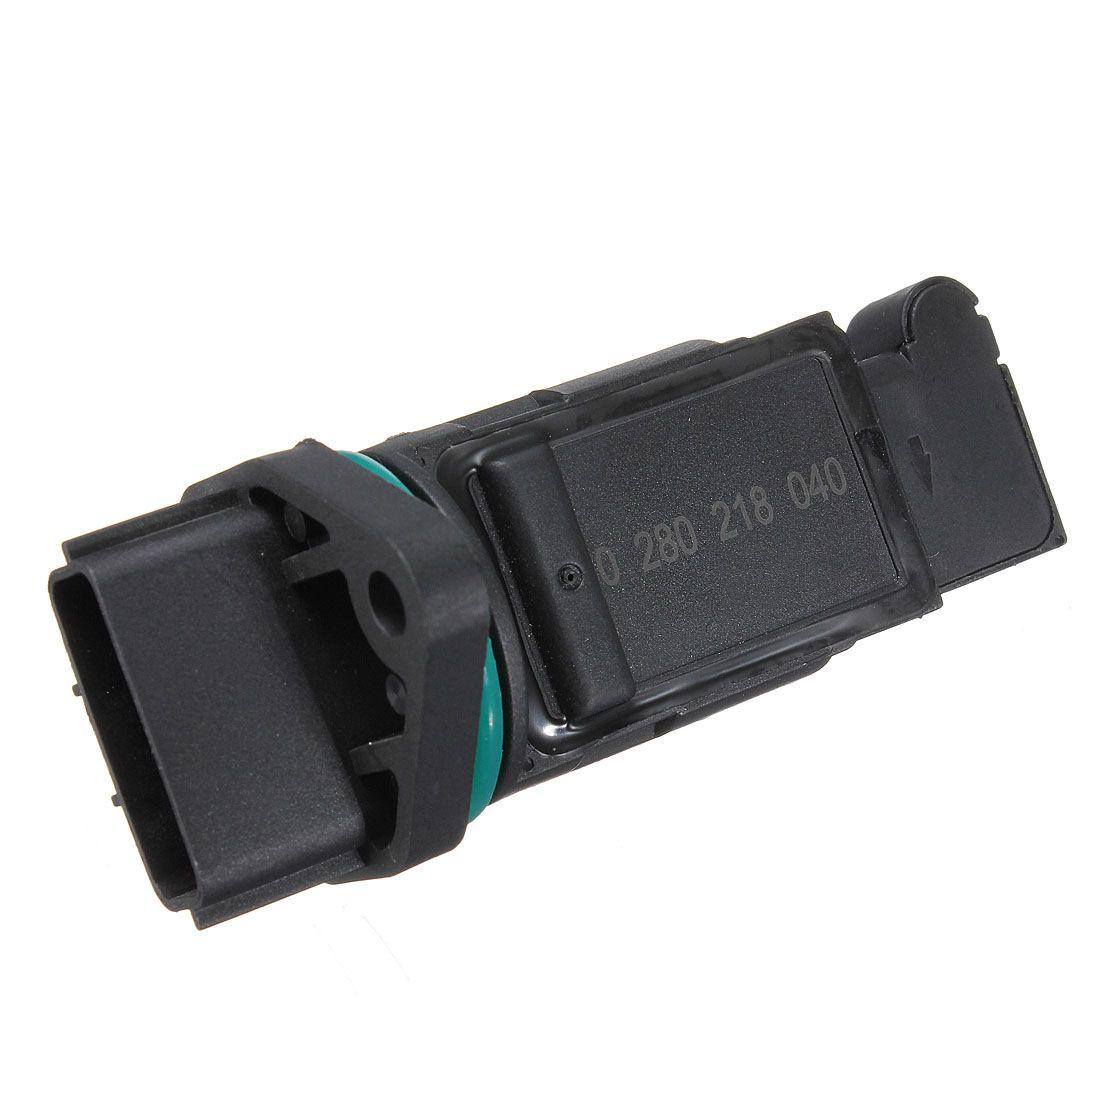 low priced 6b160 55bde Compre Sensor De Flujo De Aire Masivo Sensor MAF Sensor Para Nissan Almera  Micra Primera 1999 2000 0280218040 A  26.38 Del Renhuai888   DHgate.Com